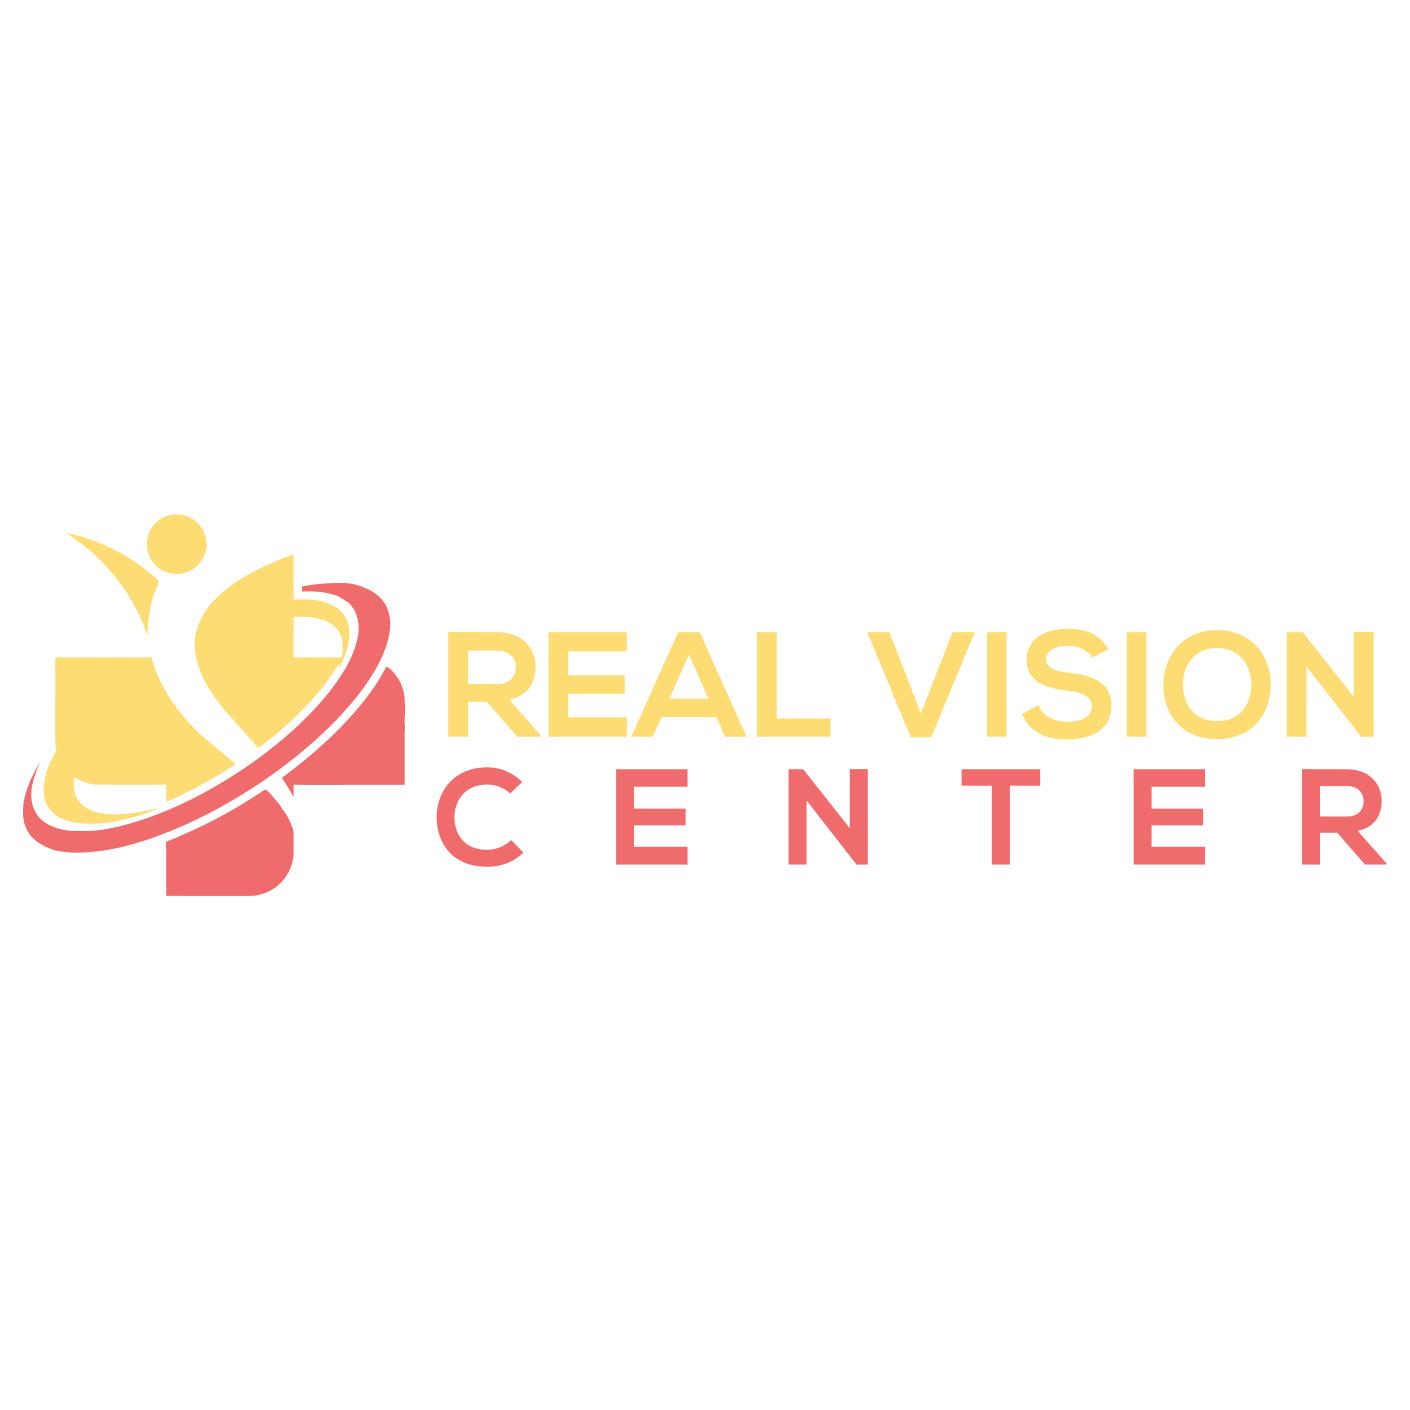 Real Vision Center - Pembroke Pines, FL 33027 - (954)367-6333 | ShowMeLocal.com